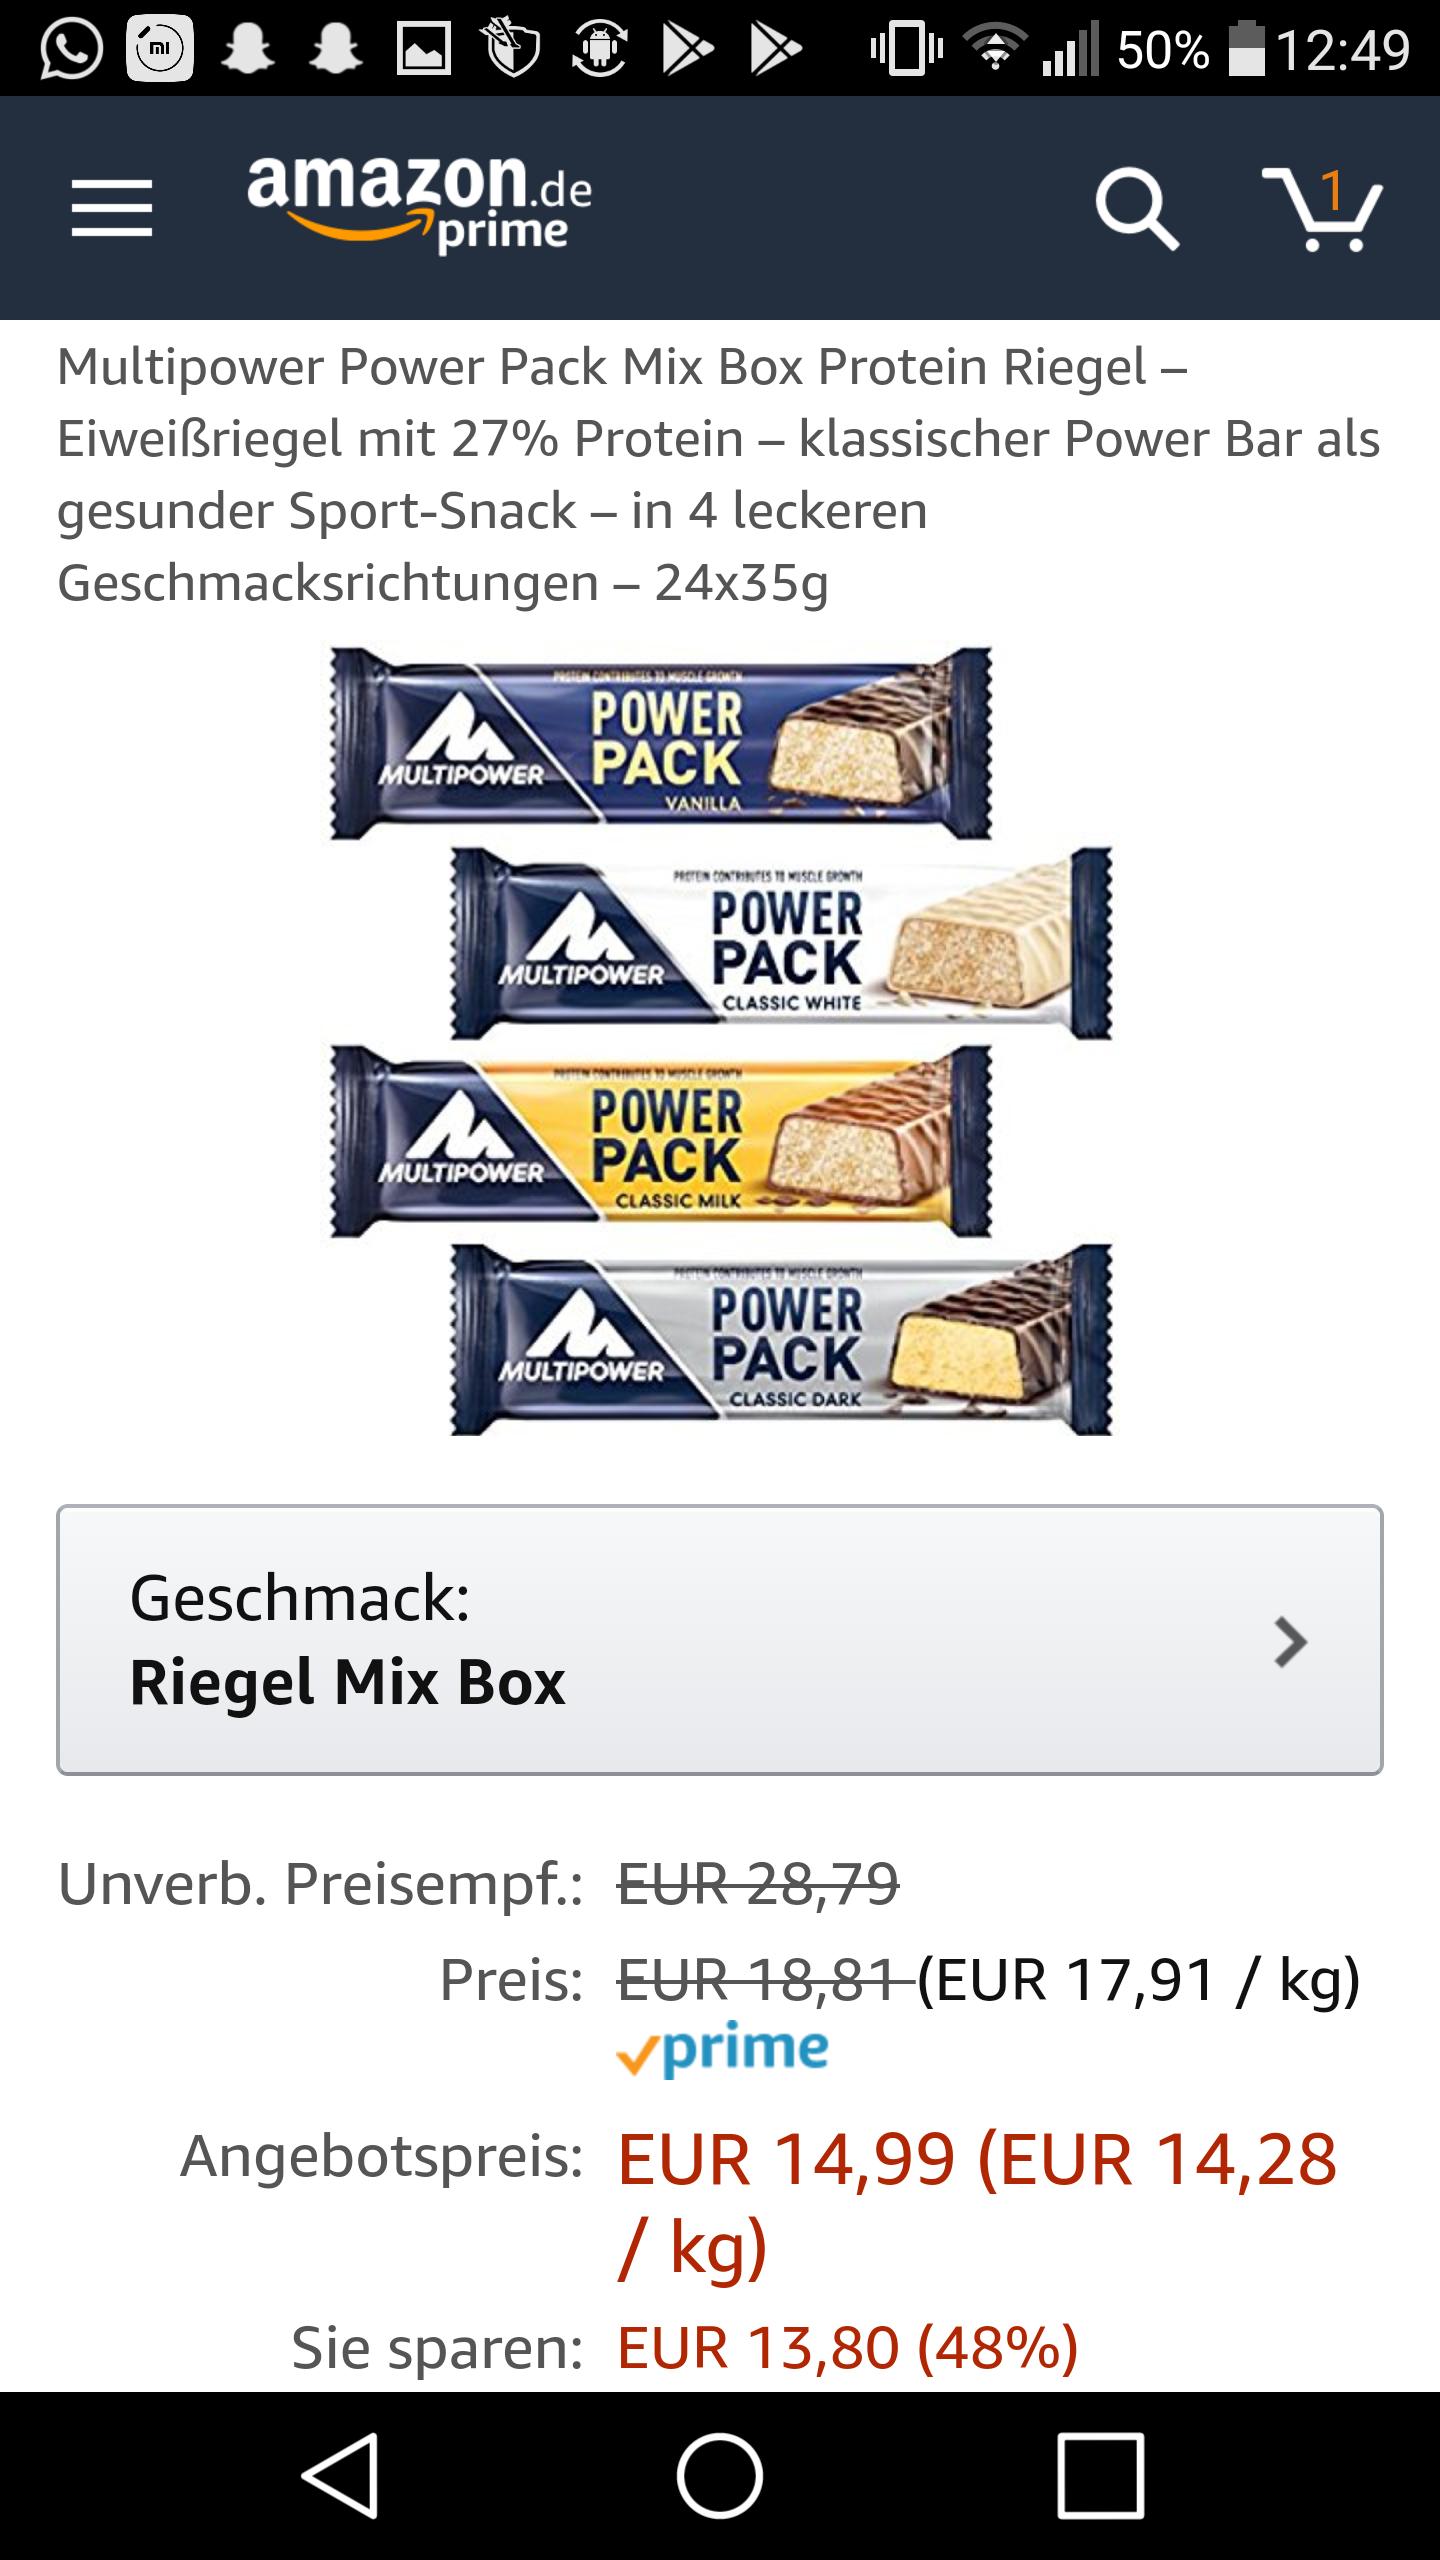 Amazon Prime Day Multipower Protein / Eiweiß Riegel Mix Box 24x35g